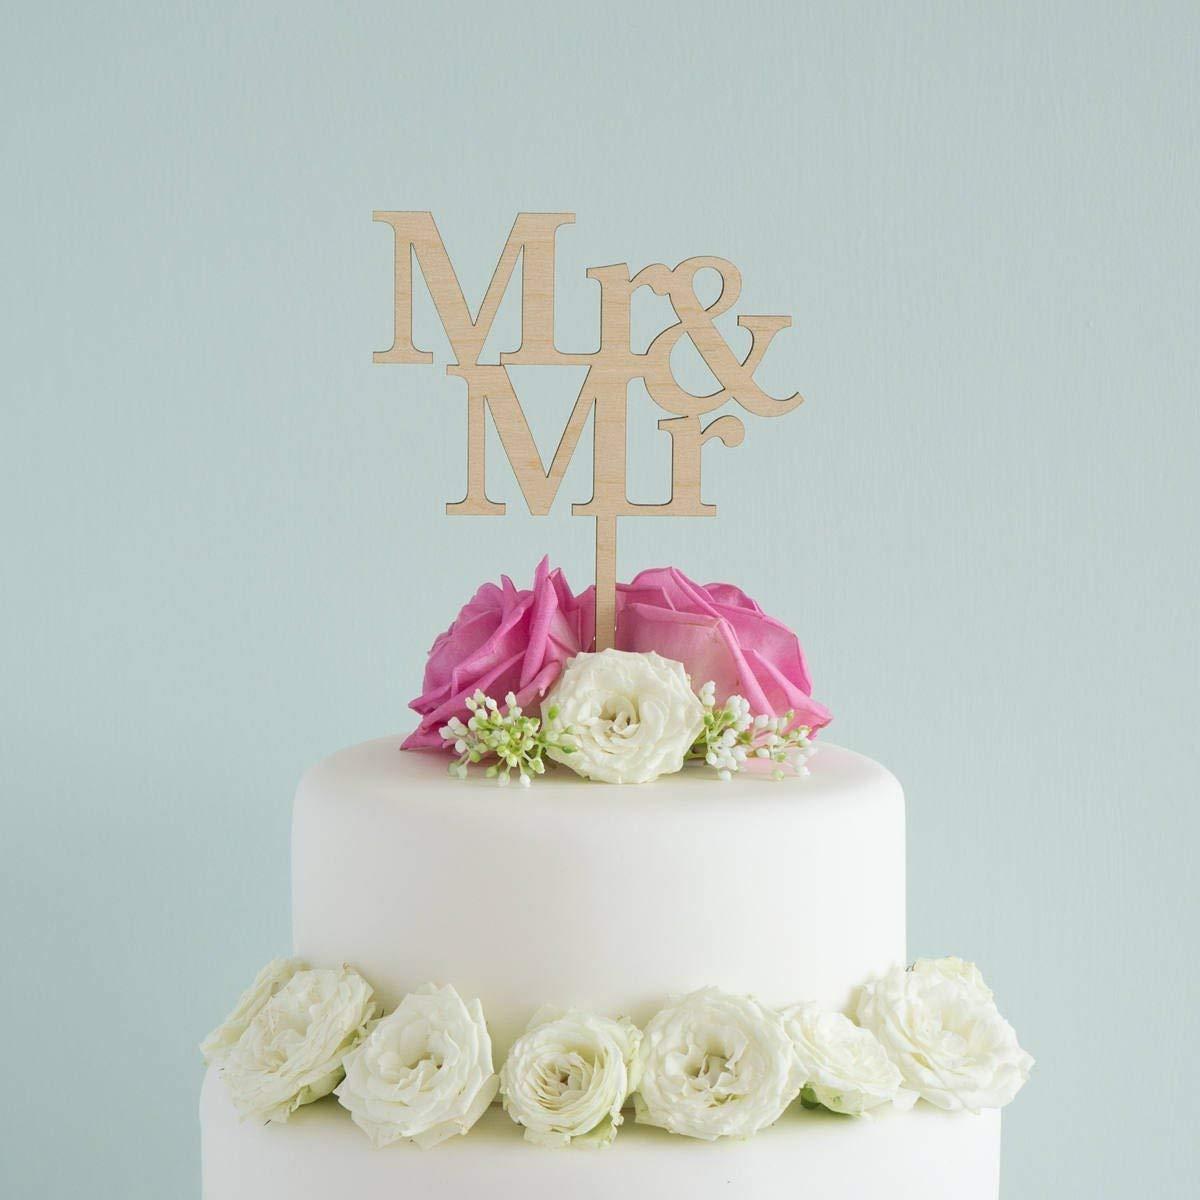 Mr And Mr Wedding Cake Topper Lgbtq Gay Civil Partnership Cake Decoration Engagement Party Decor Amazon Co Uk Handmade